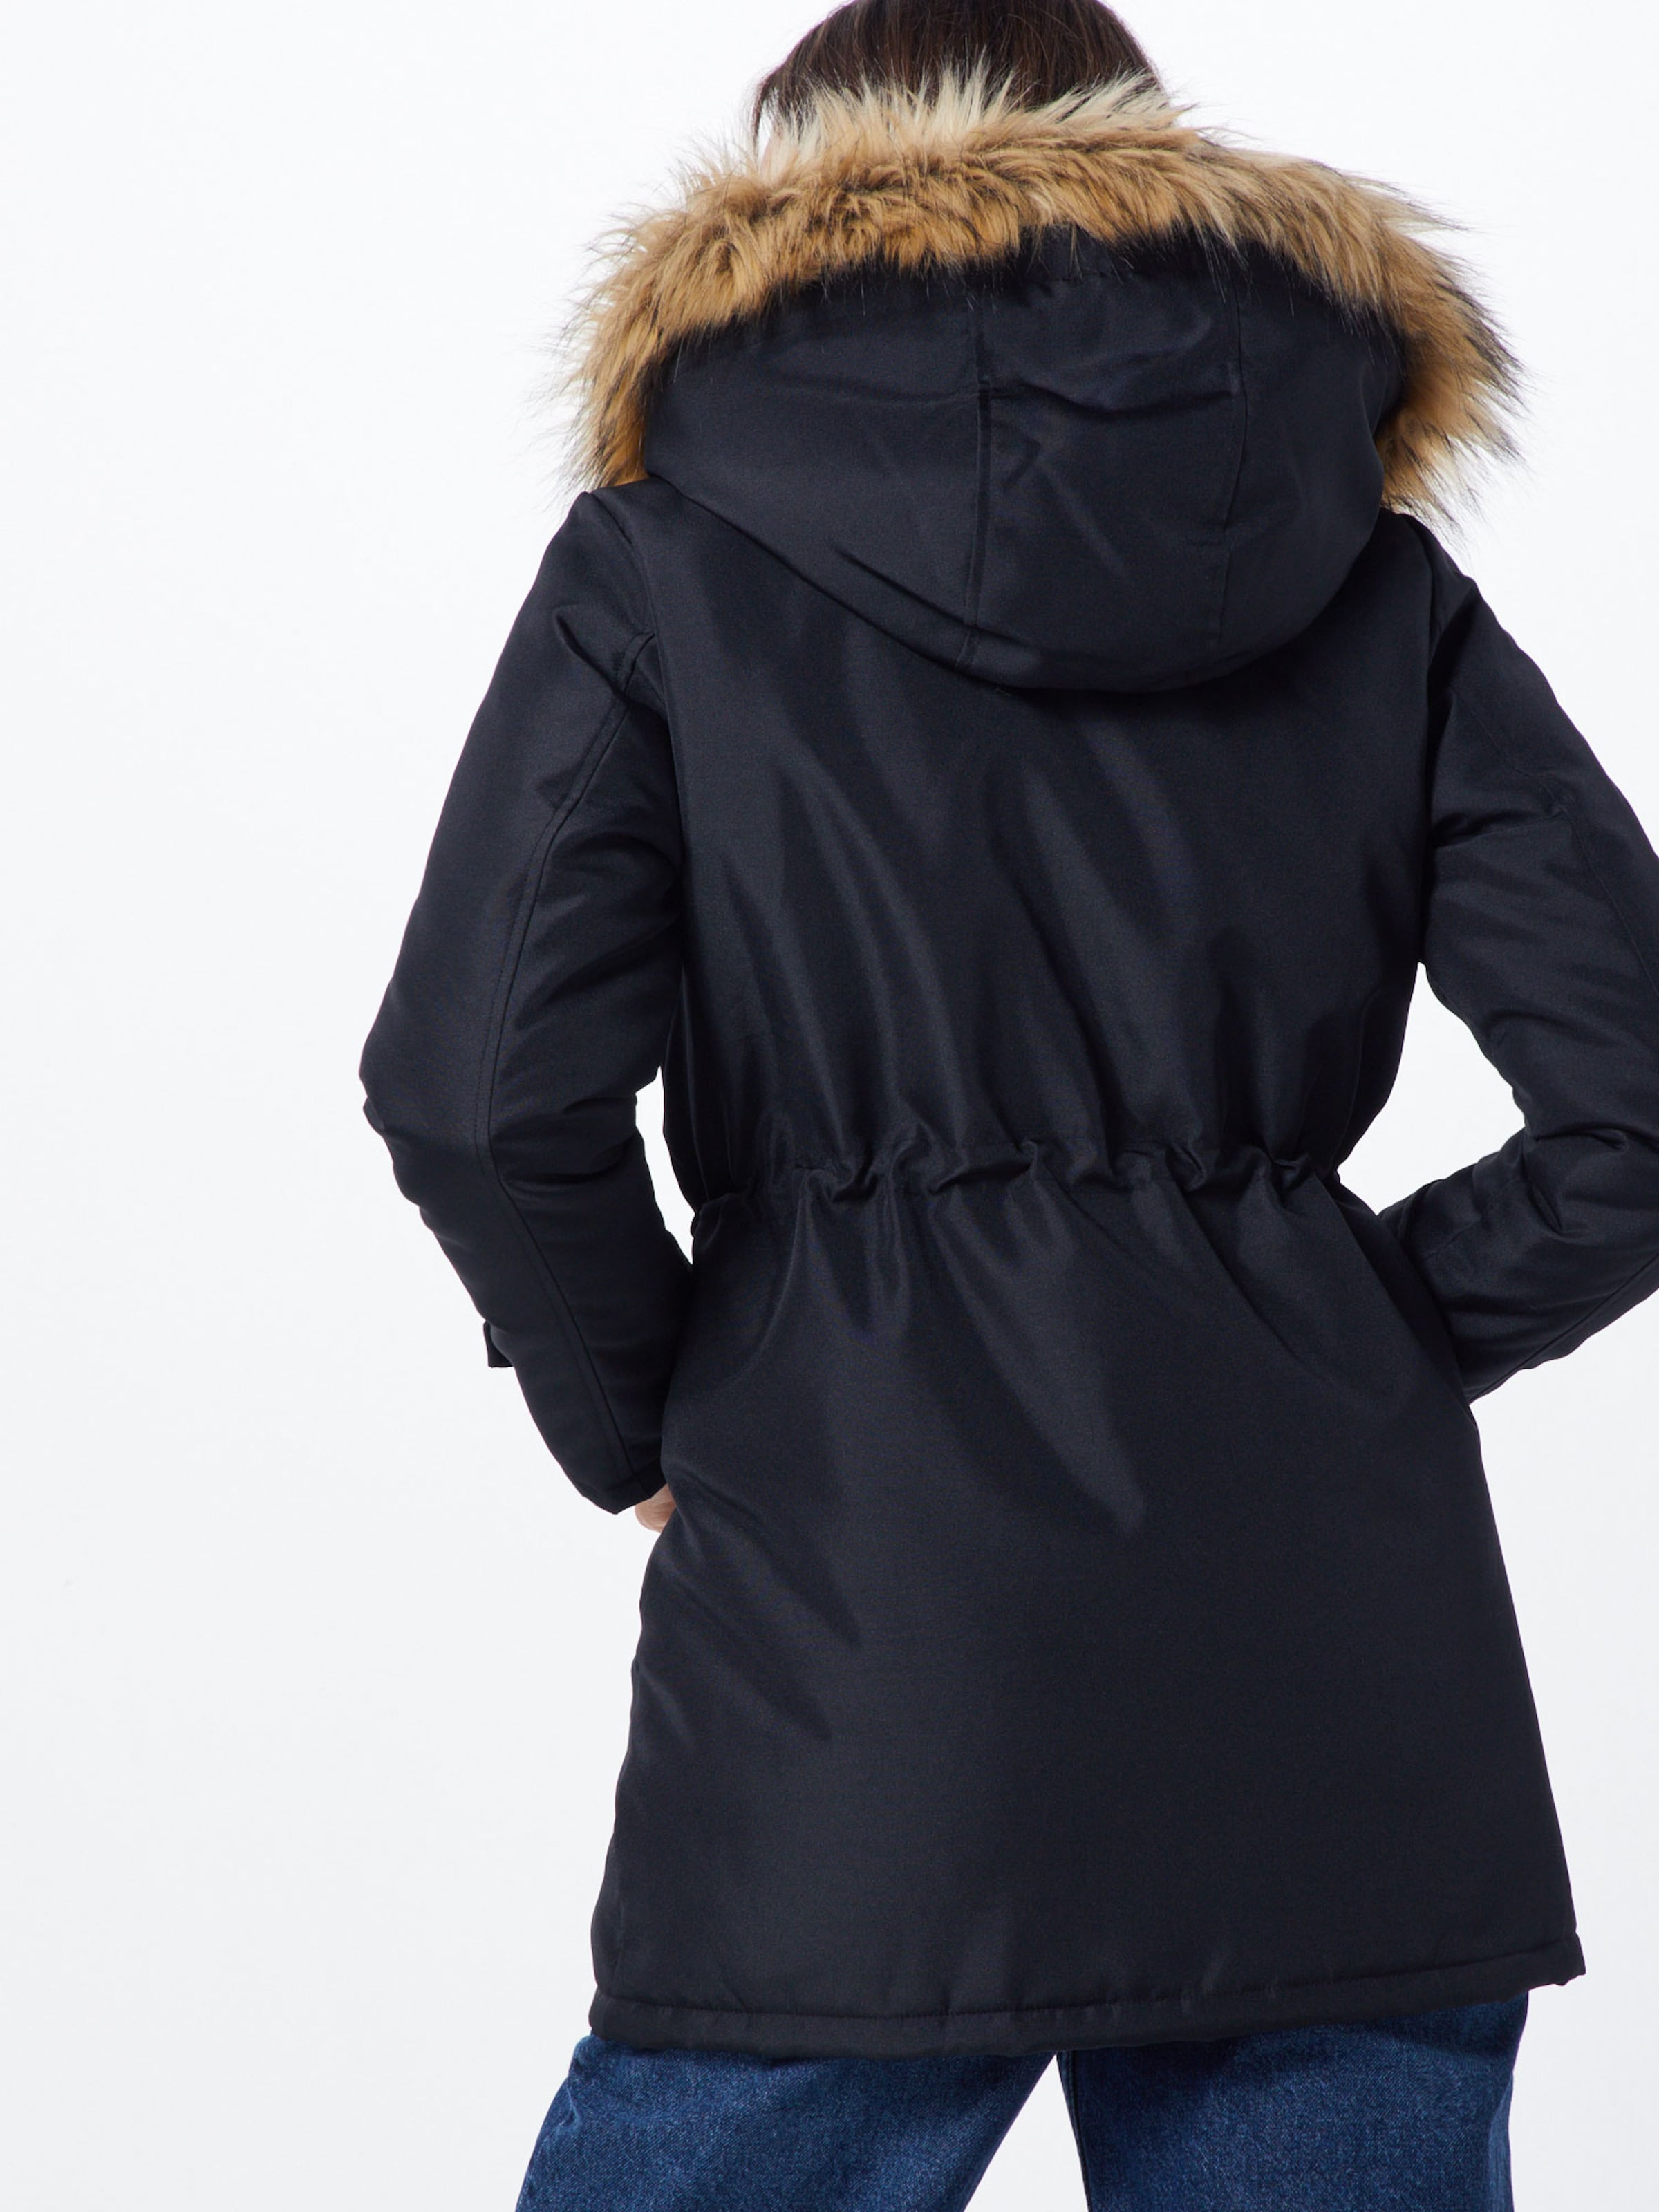 'nmlou D'hiver s Parka L May Jacket' Noir Noisy En SMVGqUzLp